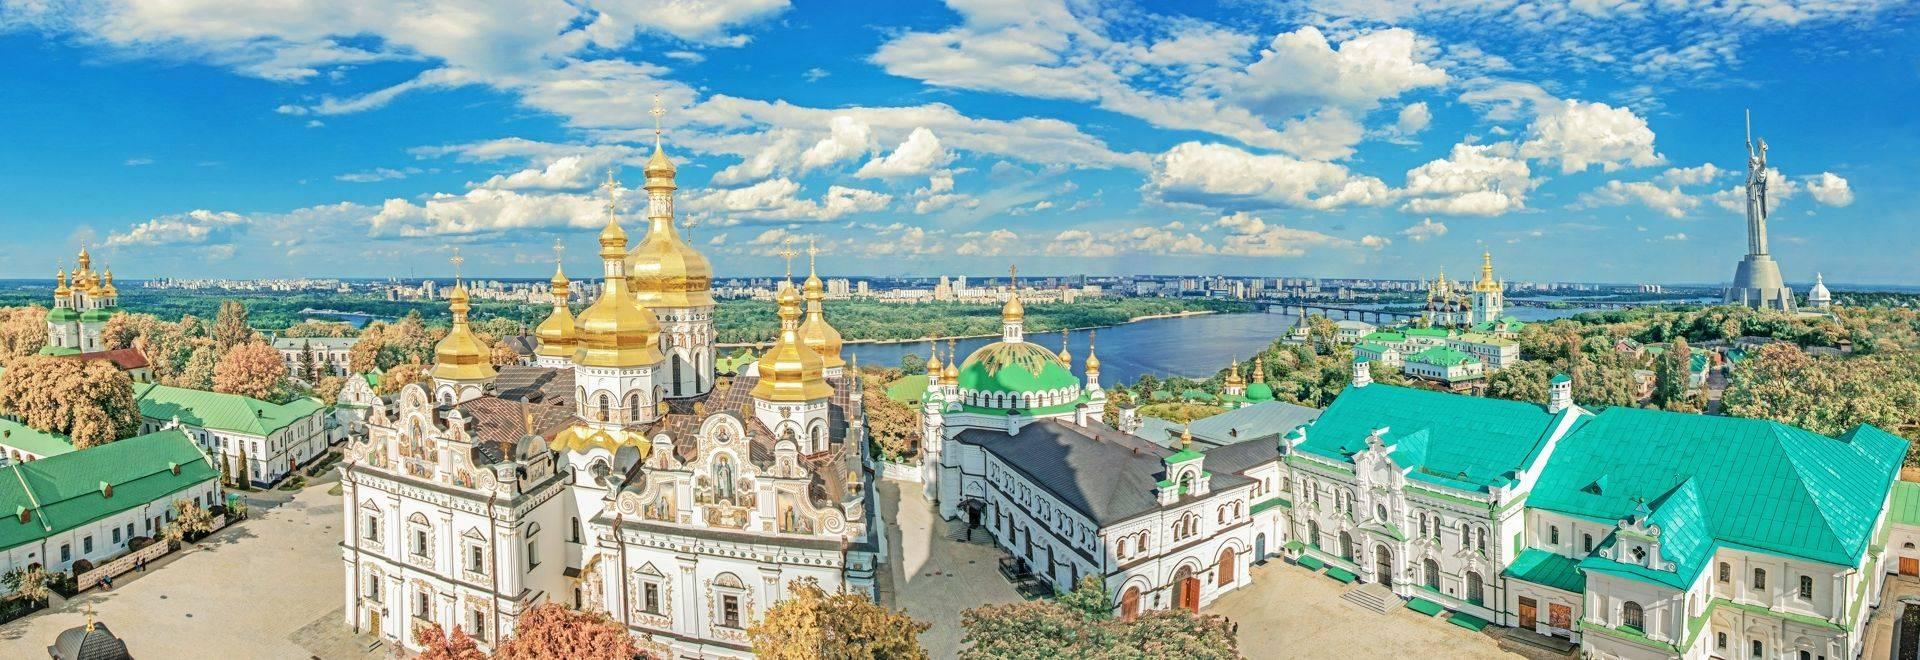 Kiev. Ukraine. Kiev Pechersk Lavra or the Kiev Monastery of the Caves.